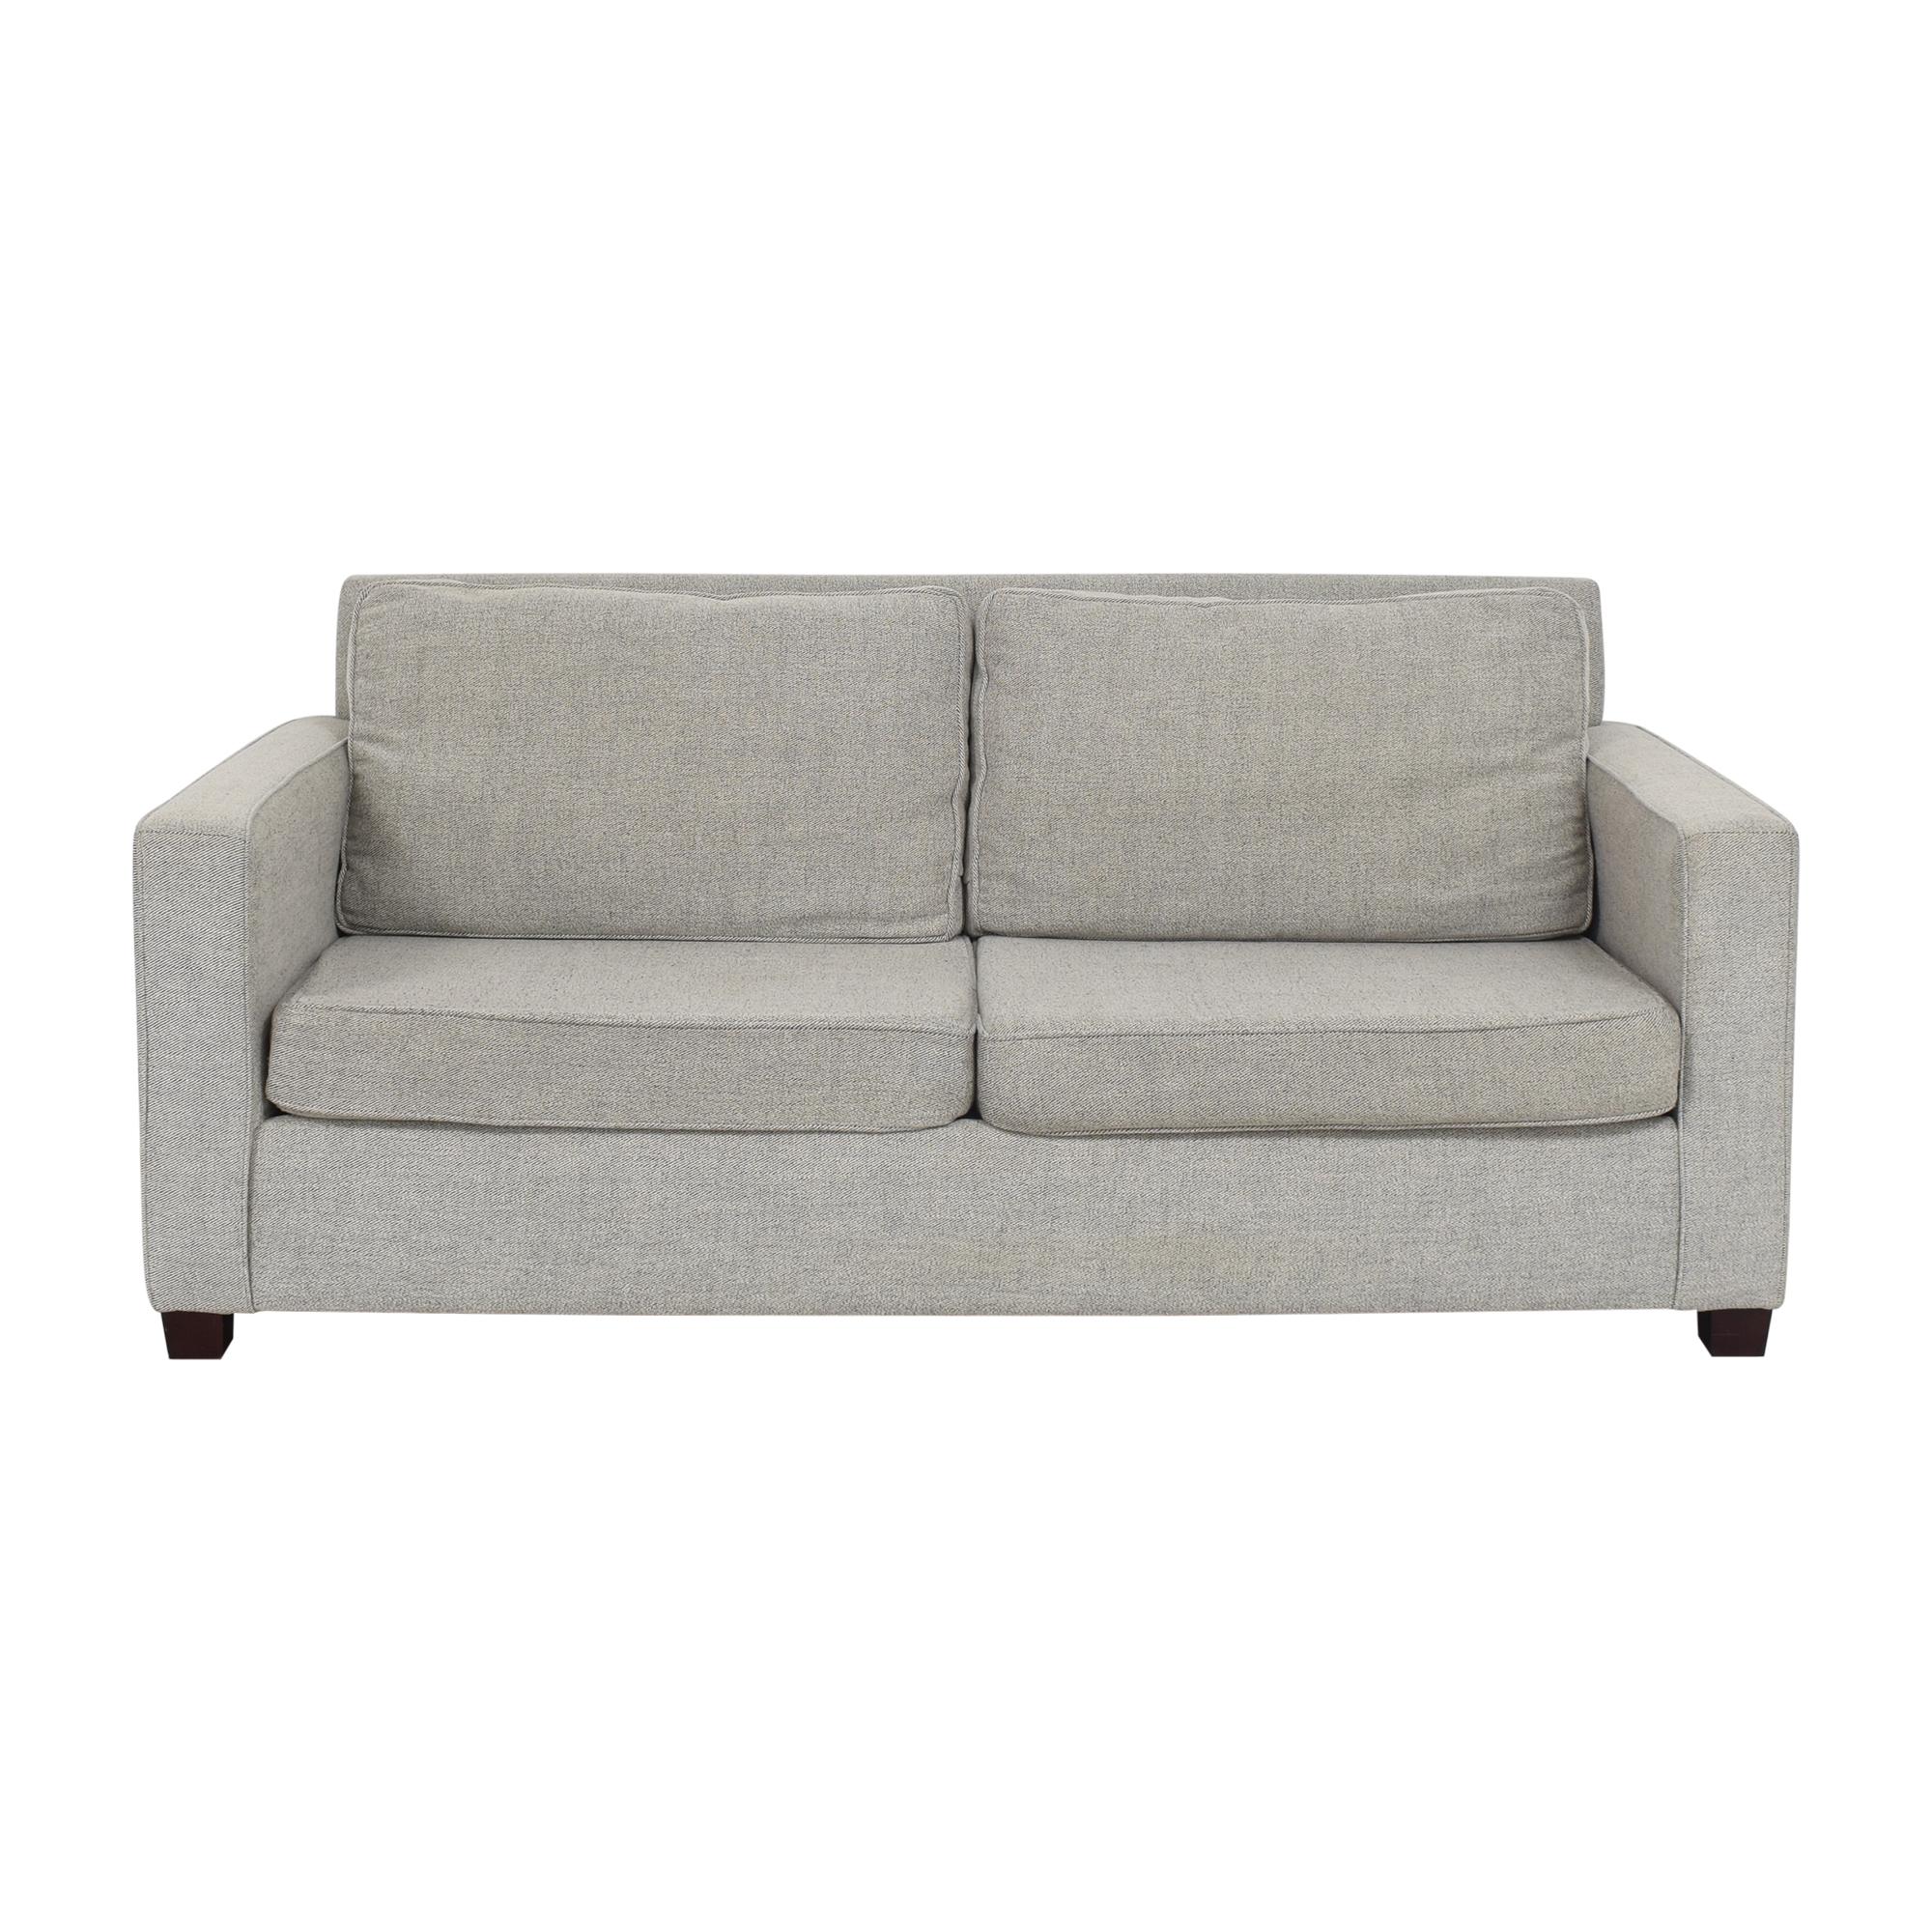 buy West Elm Henry Two Cushion Sofa West Elm Classic Sofas